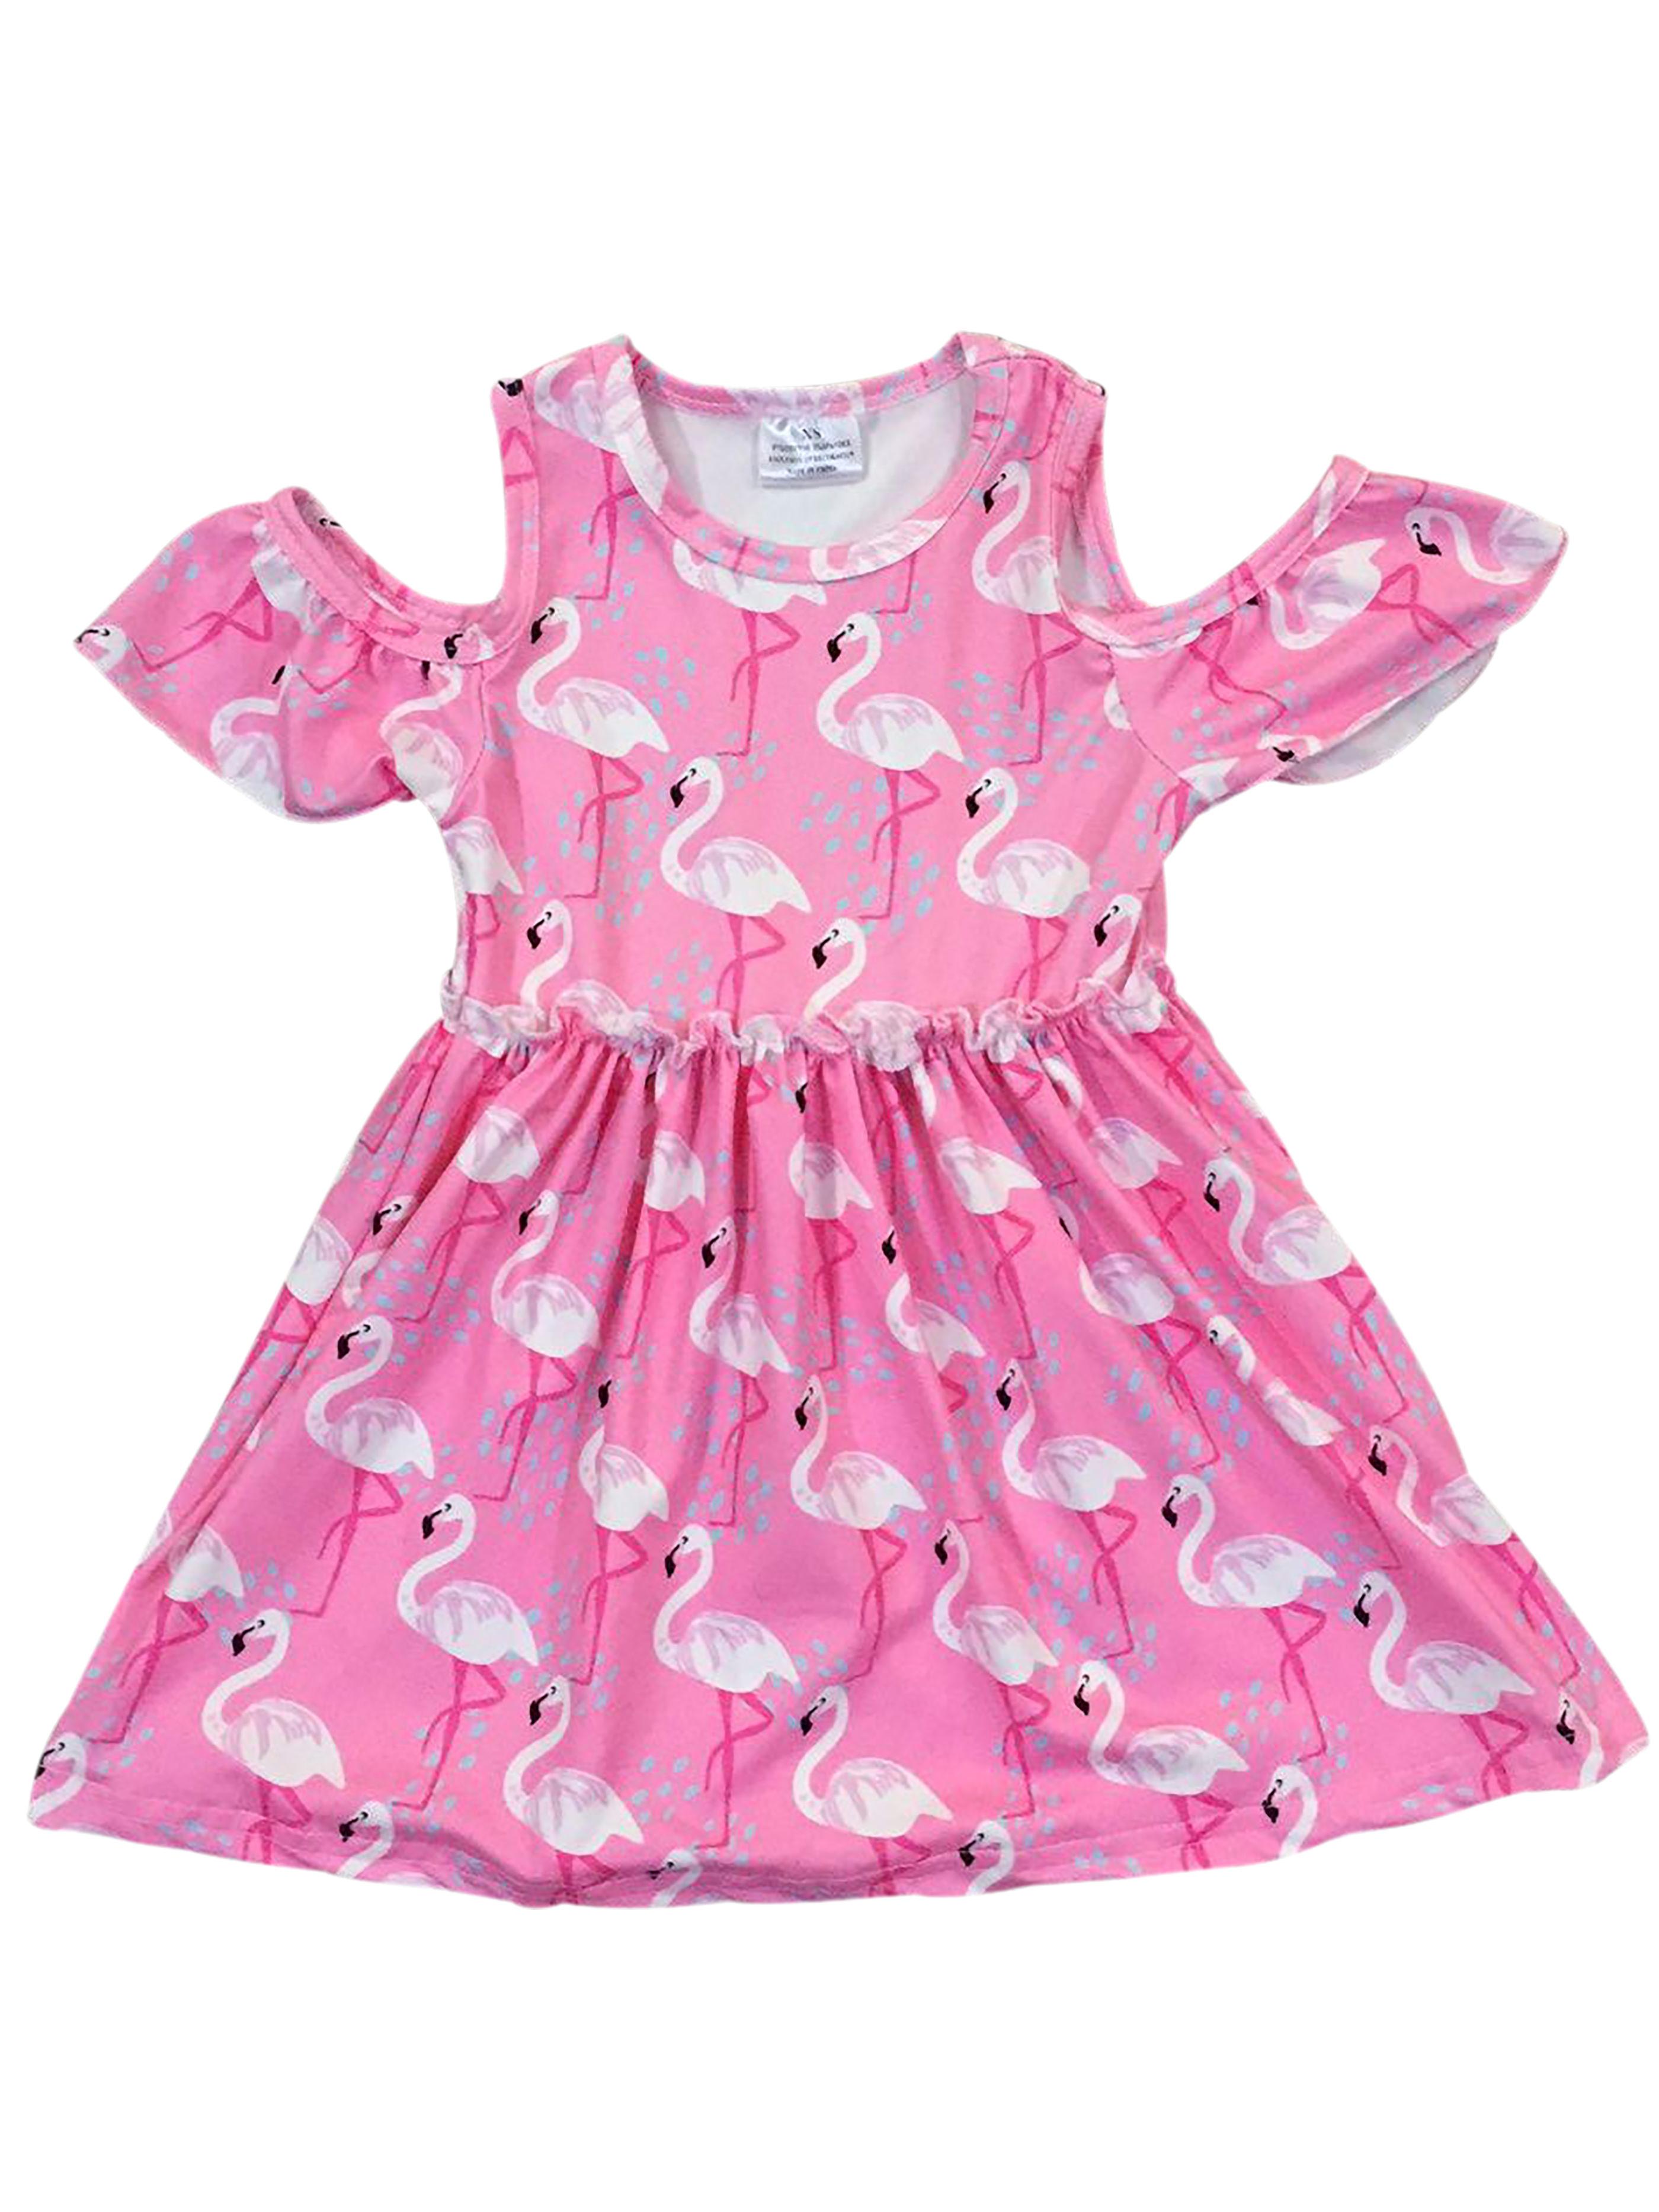 Sunny Fashion Girls Dress Flamingos Lotus Print Wave Waist Bow Tie Size 6-12